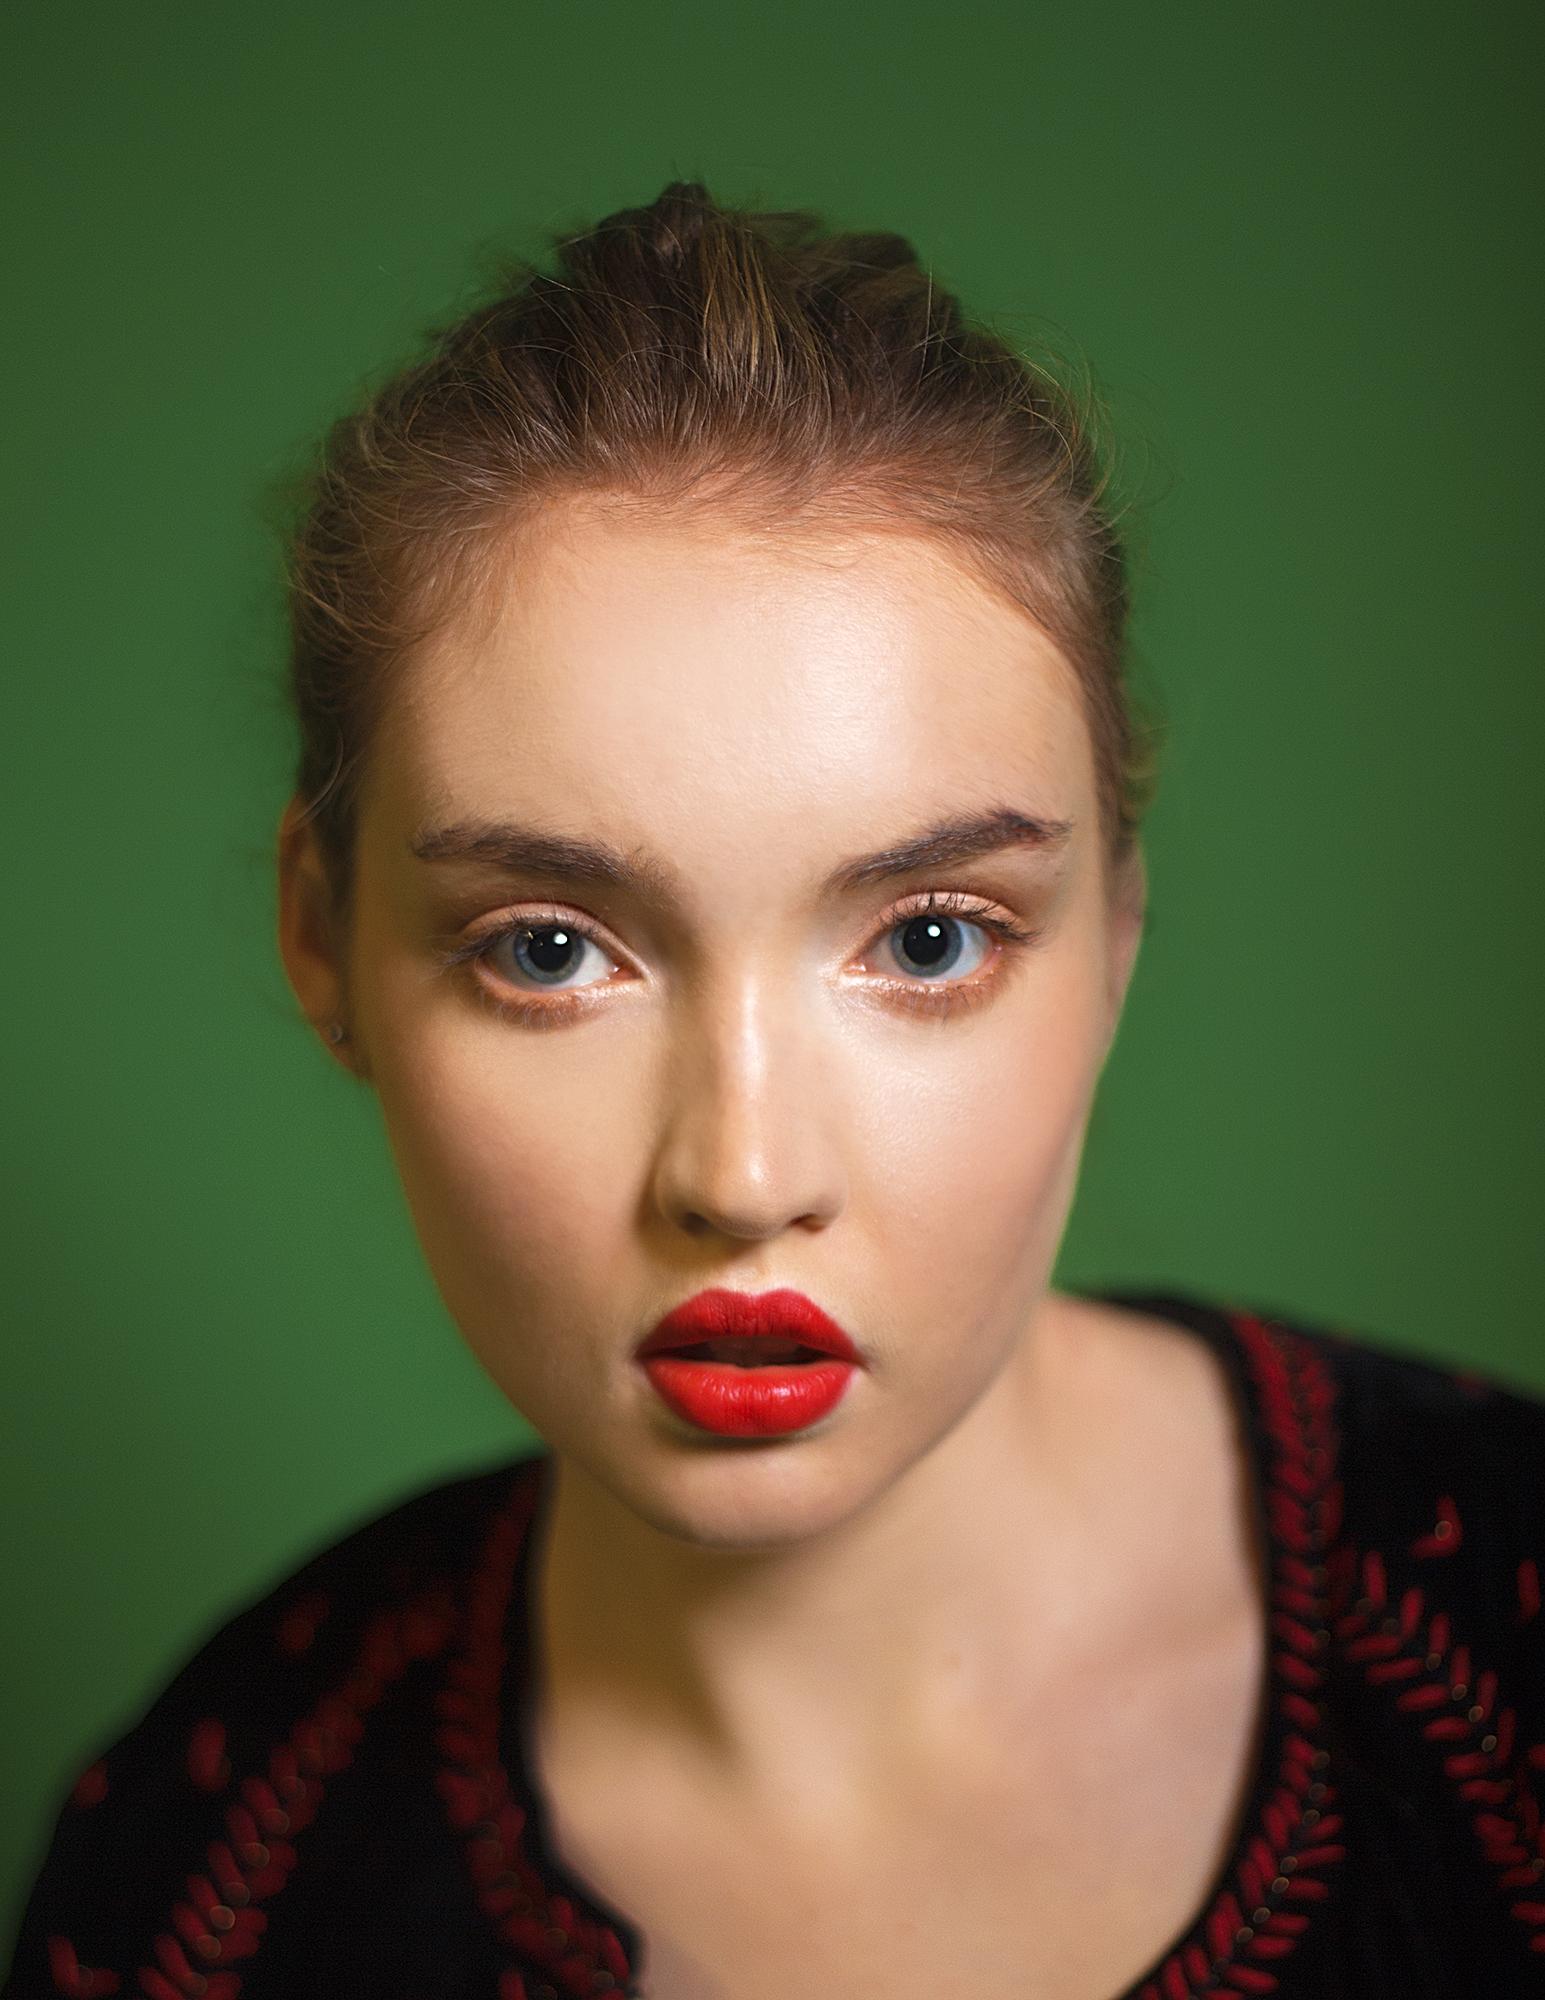 blonde valentino russian ukrainian folk zara valentino red lips studio laura one nancy morris kat terek fashion beauty photography bohenian boho greenery slavic polish